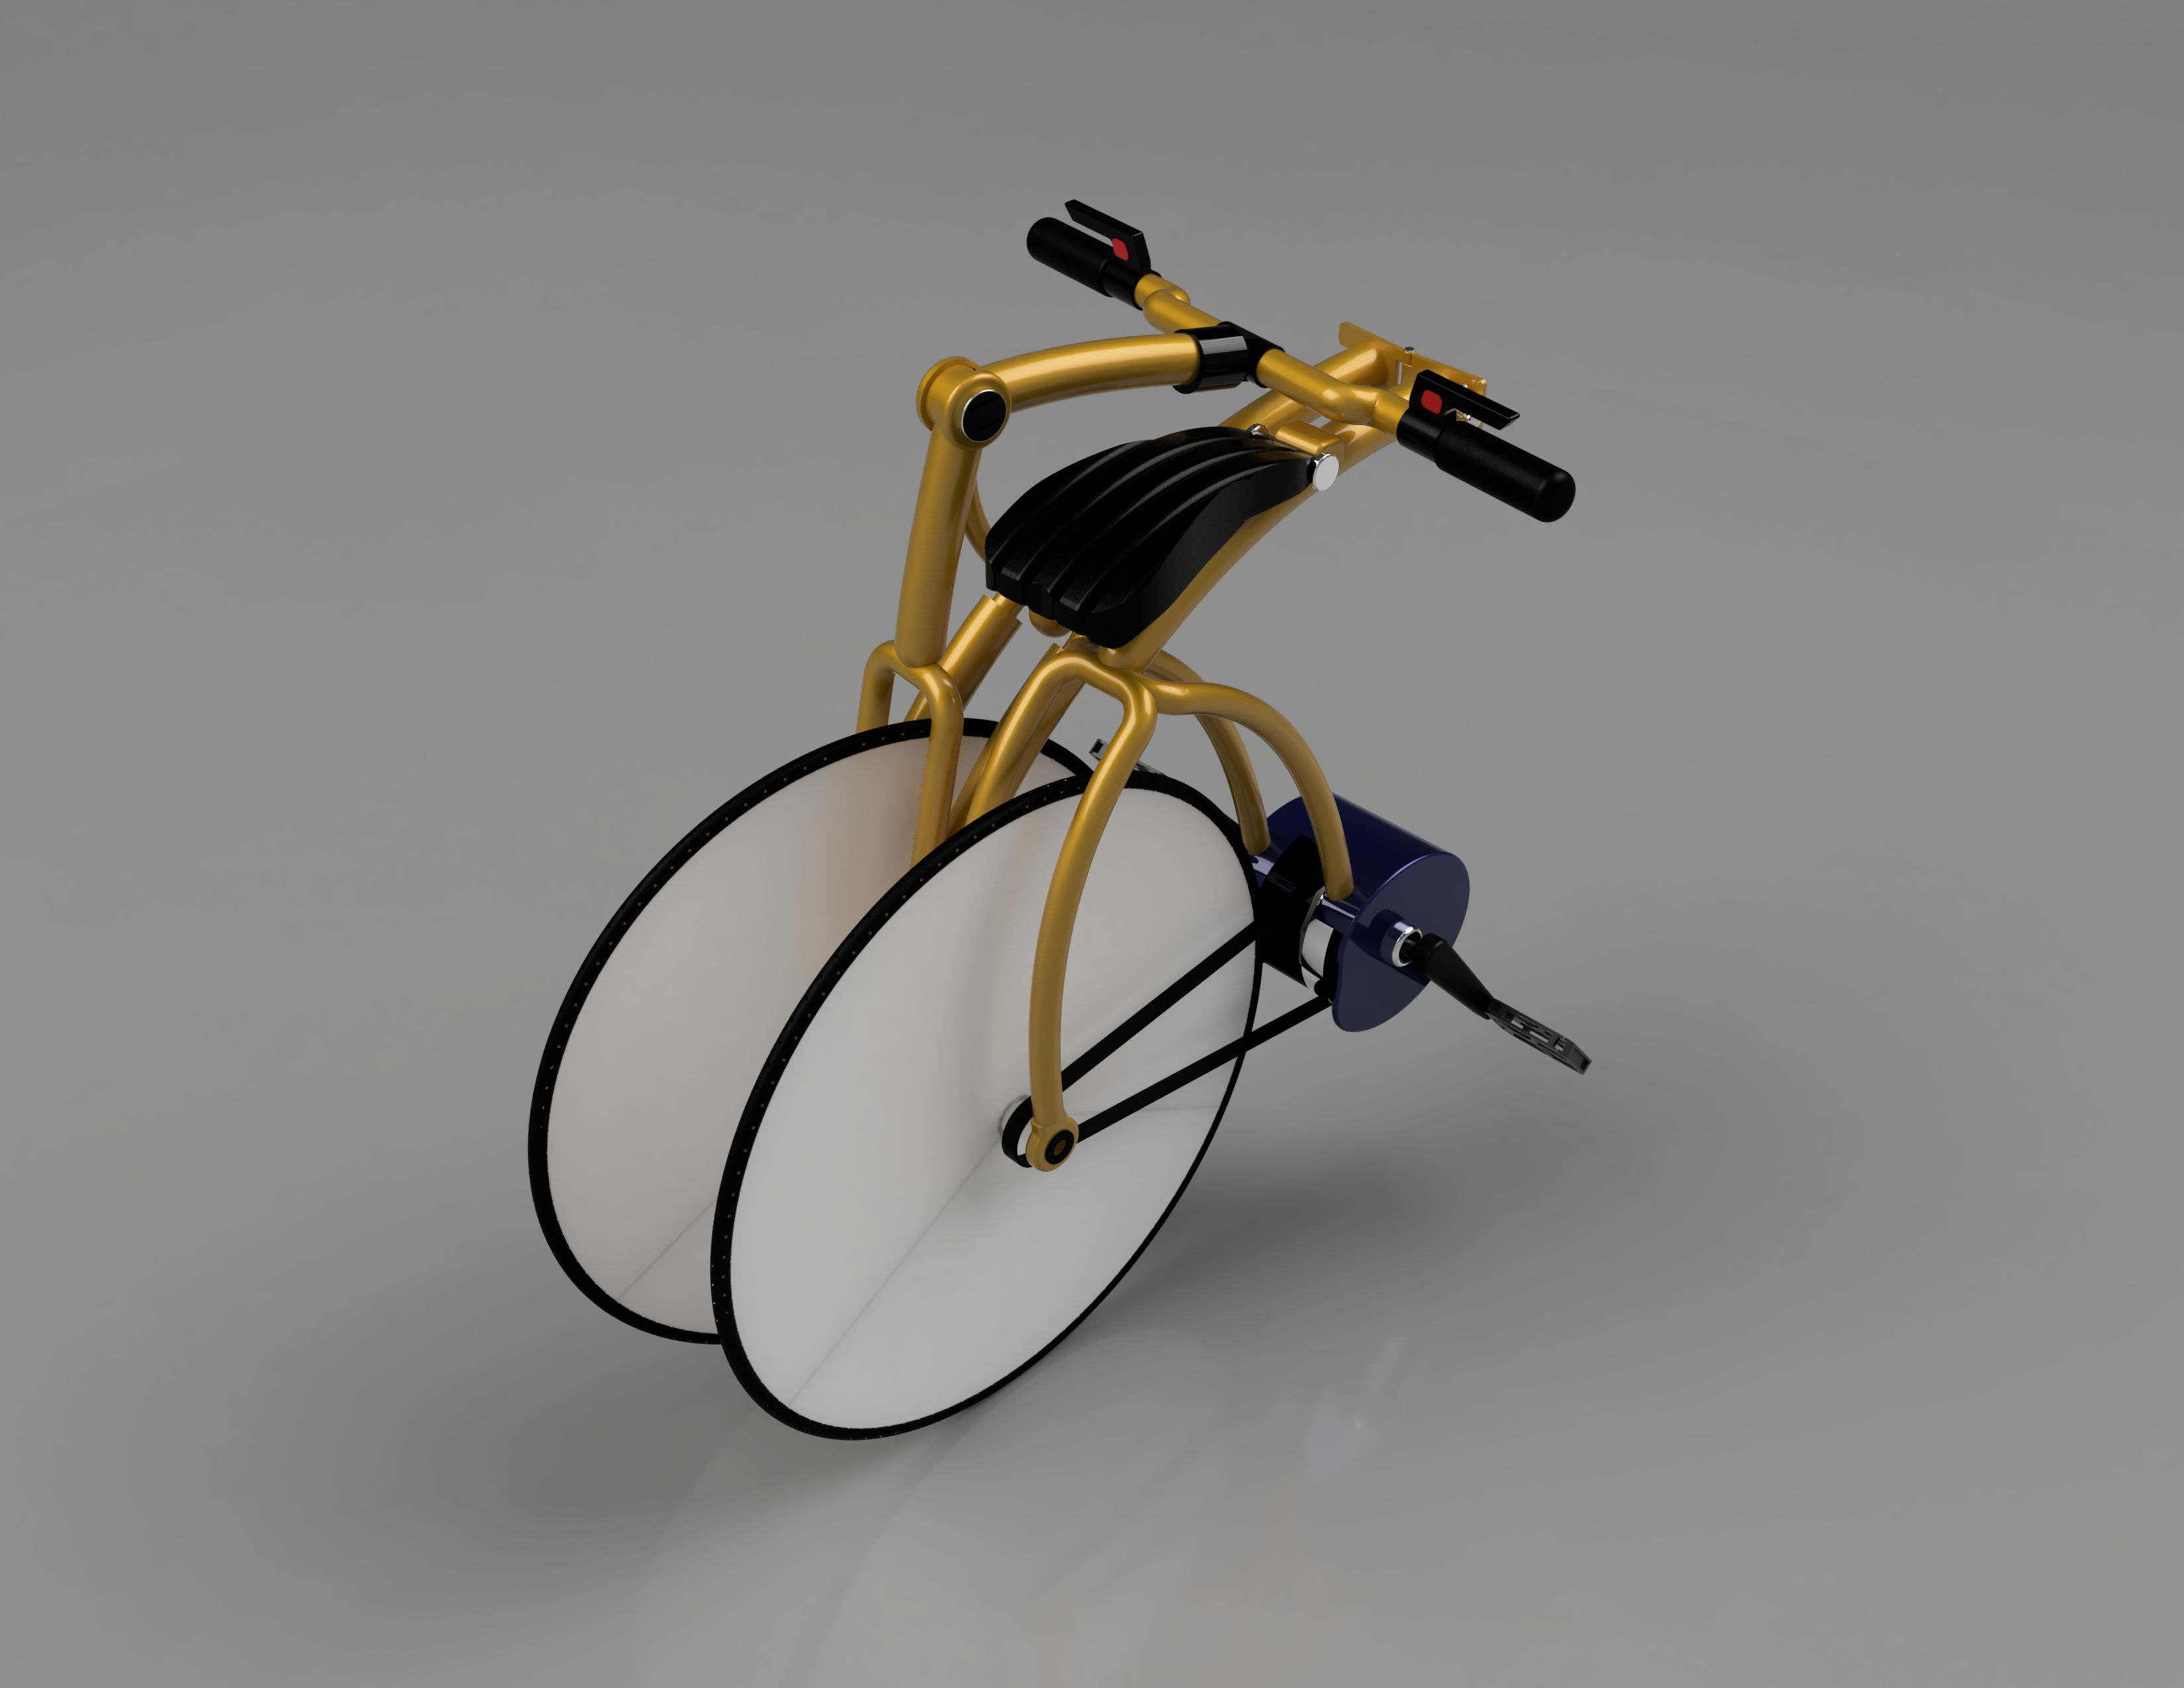 Diana--bici-ddd-2020-mar-14-01-39-12am-000-customizedview12080970148-png-3500-3500